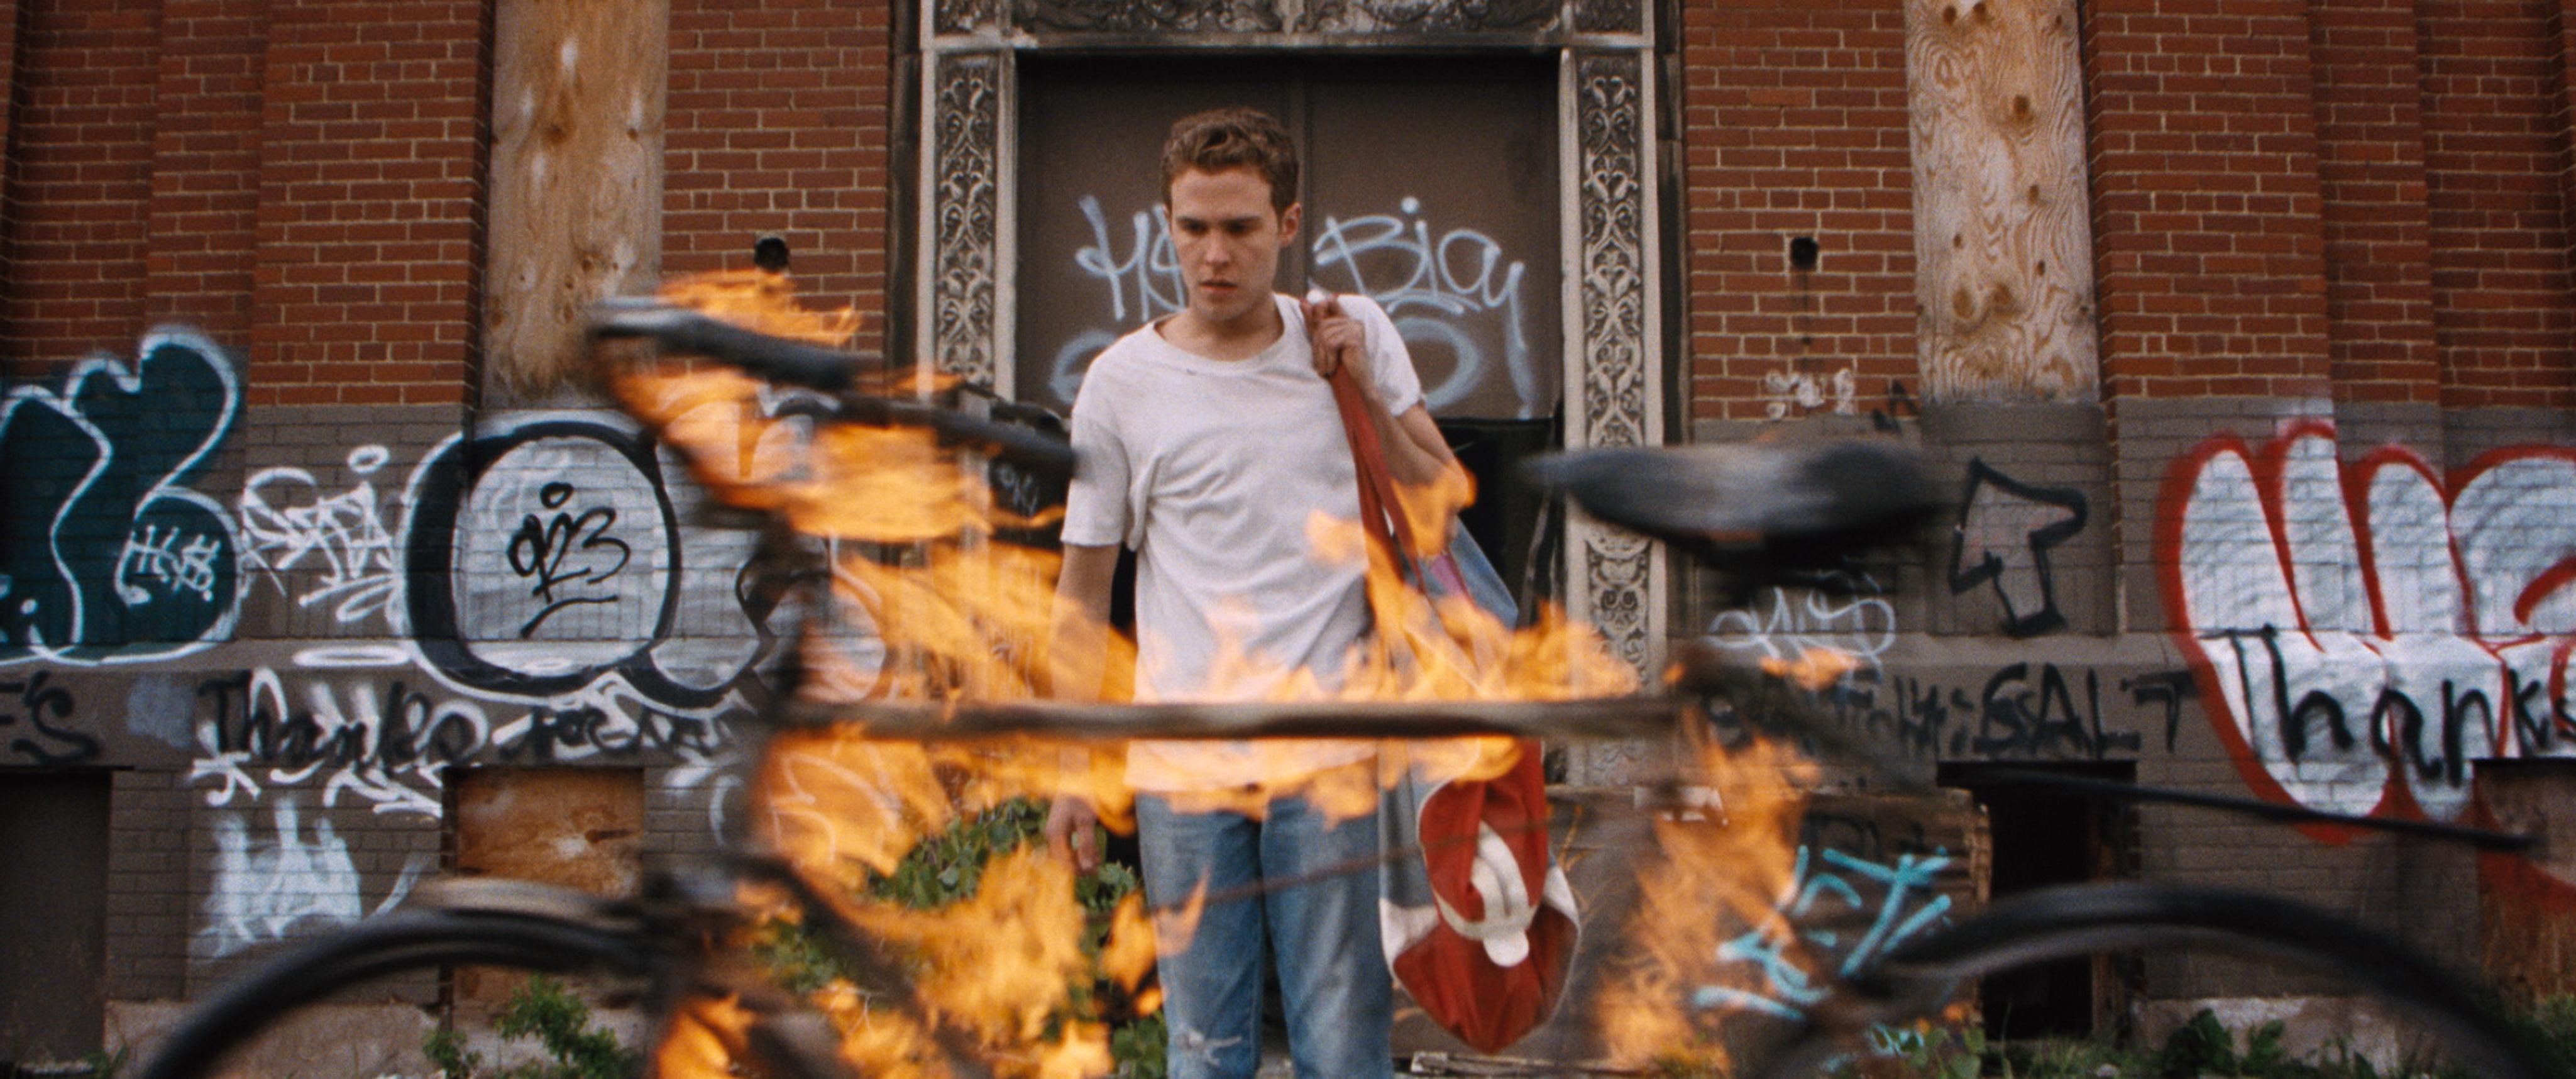 Hey girl, Ryan Gosling's new film Lost River isn't very good